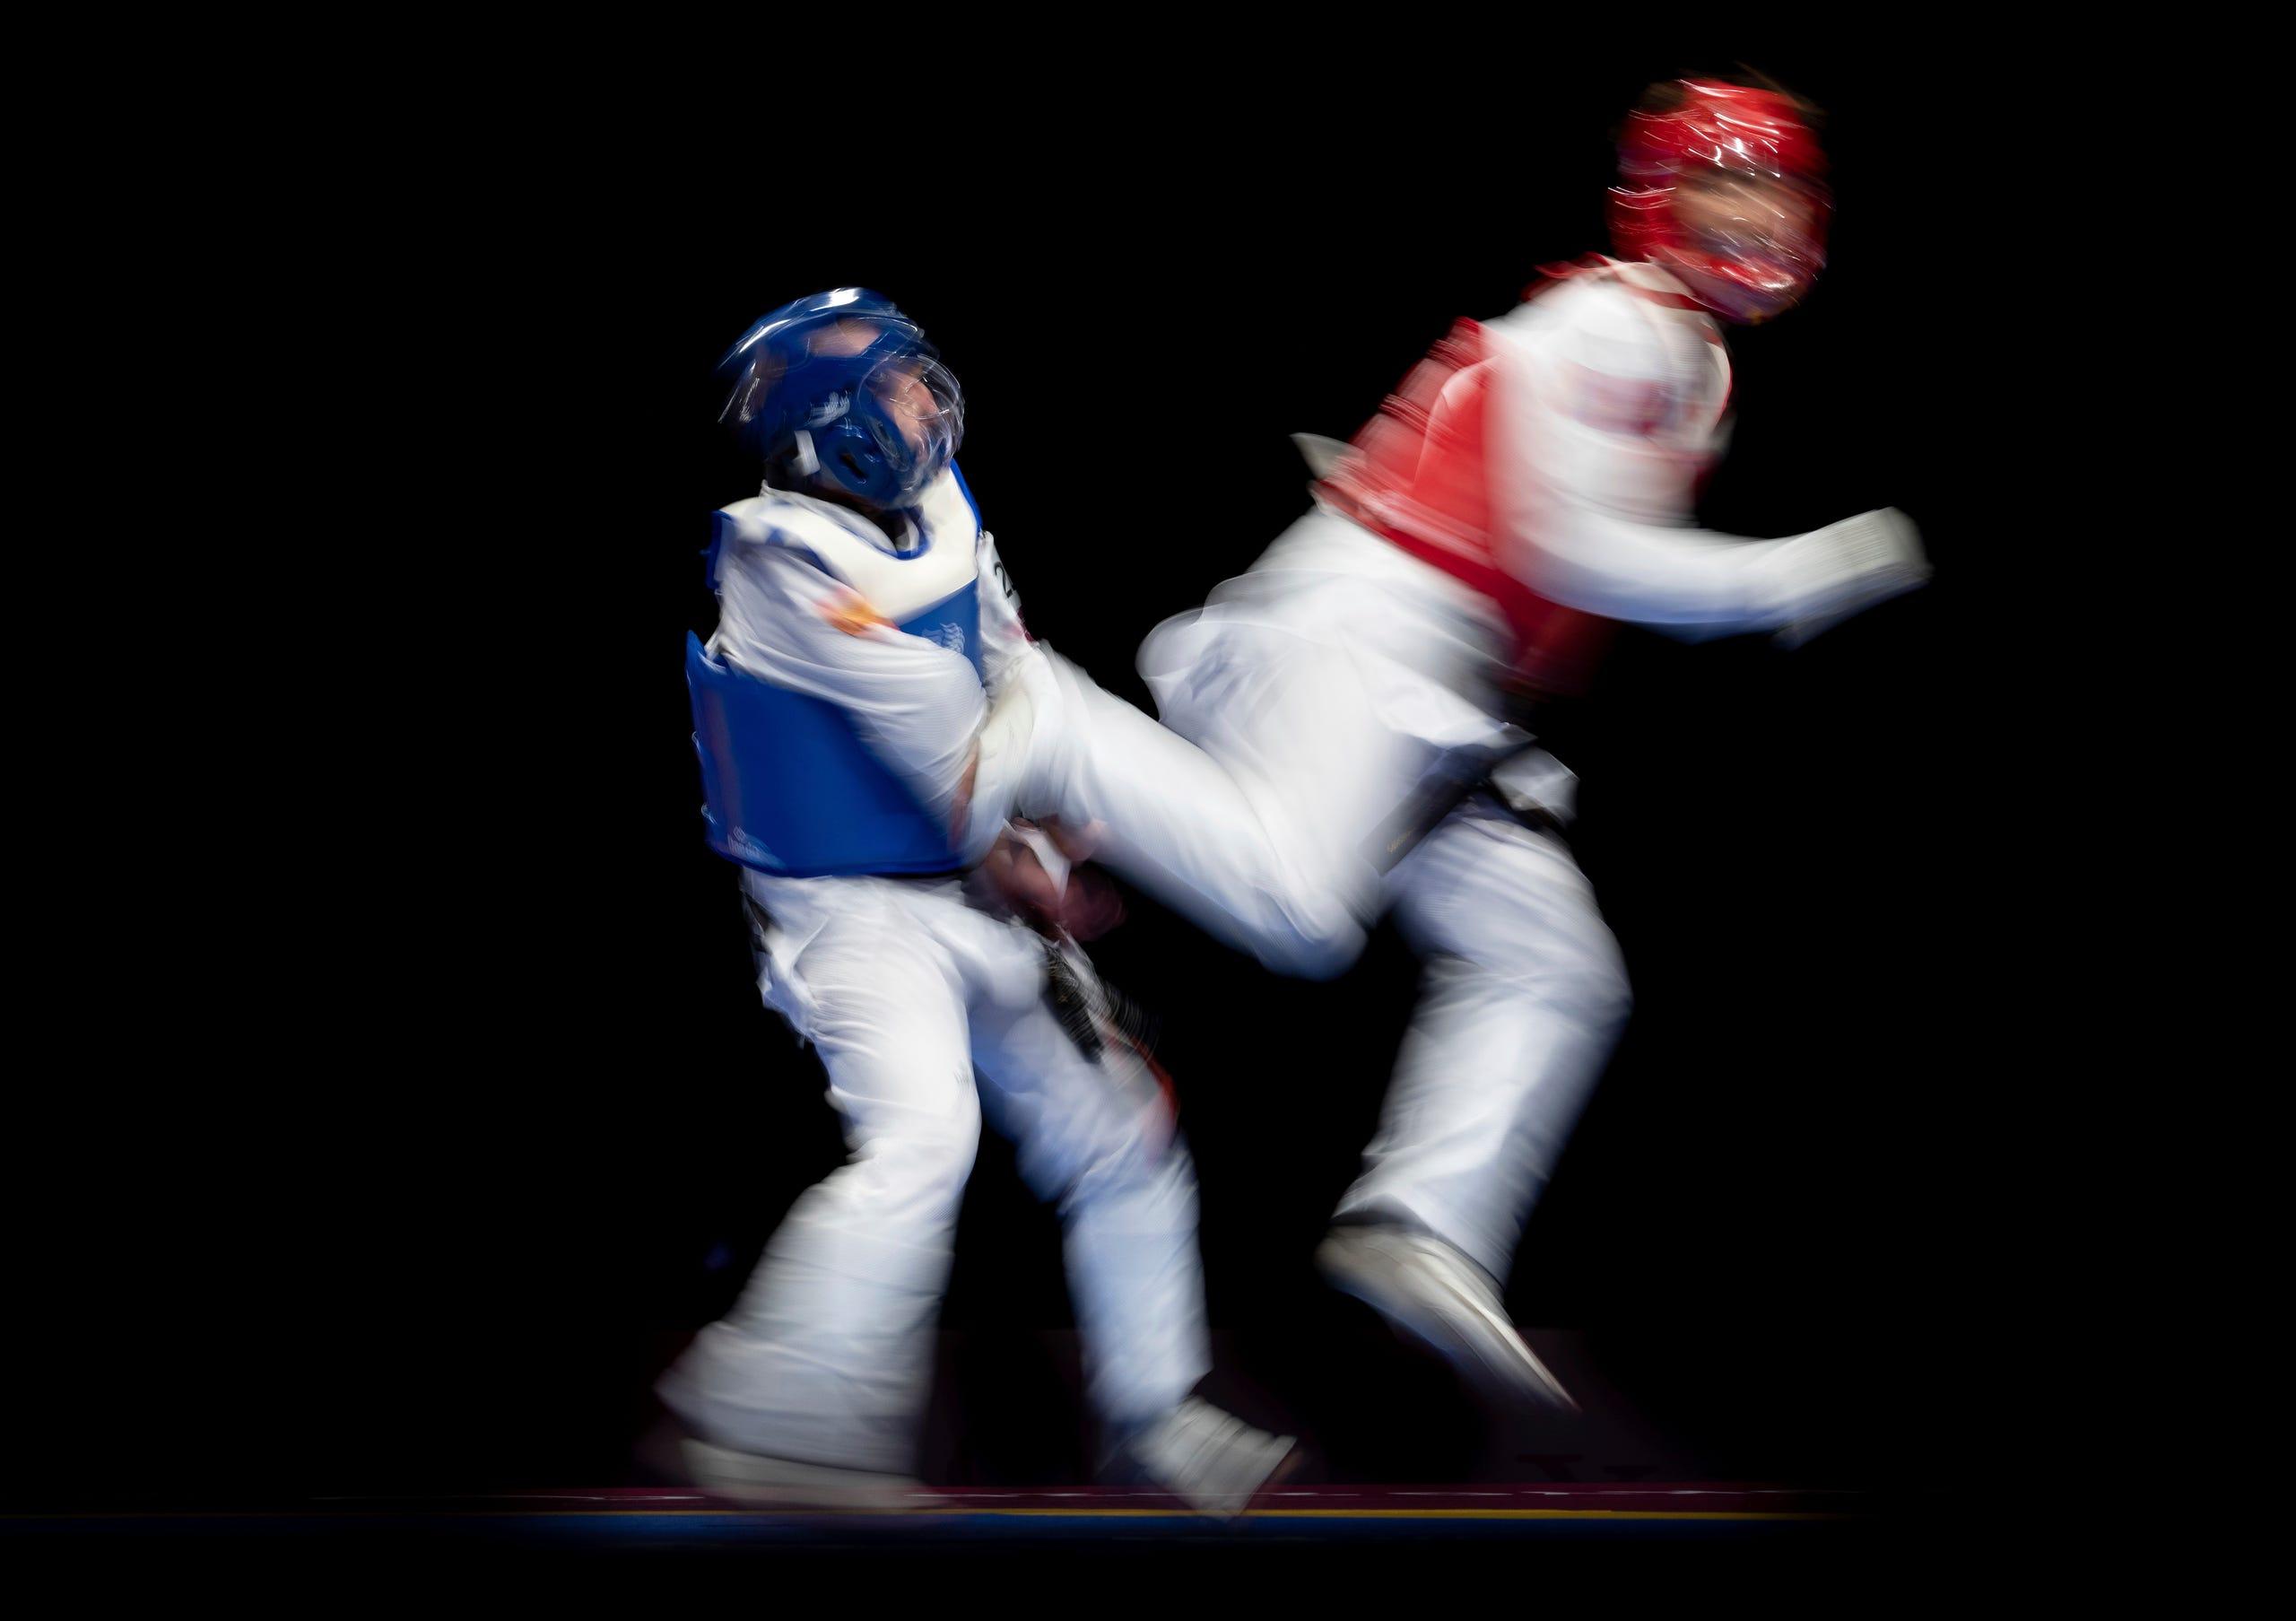 Sept. 2: Alejandro Vidal Alvarez of Spain (blue) fights against Bolor Erdene Ganbat of Mongolia (red) in the men's K44 61kg taekwondo repecharge at the Tokyo 2020 Paralympic Games in Chiba.